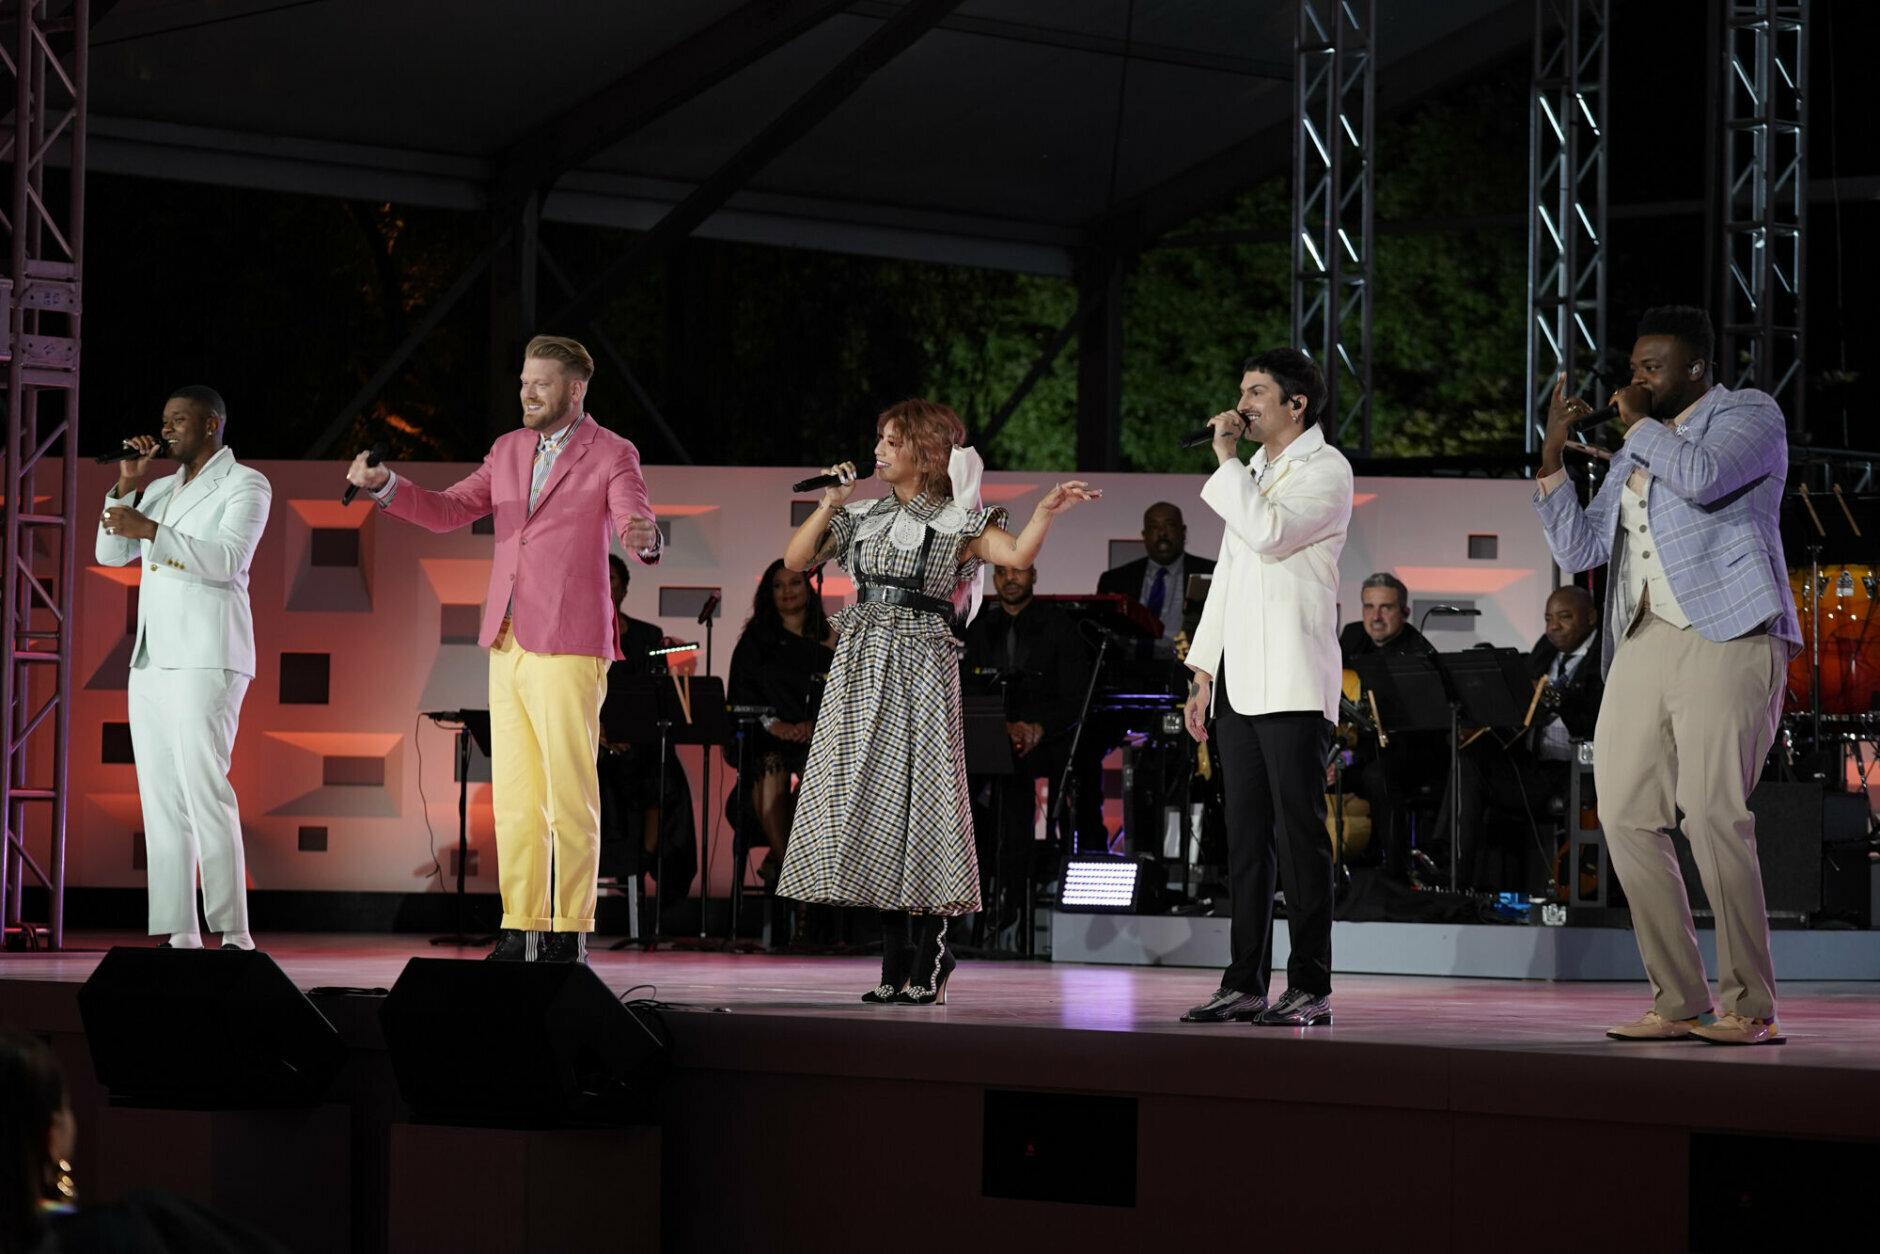 <p>Pentatonix performs. (Michele Crowe/CBS)</p>